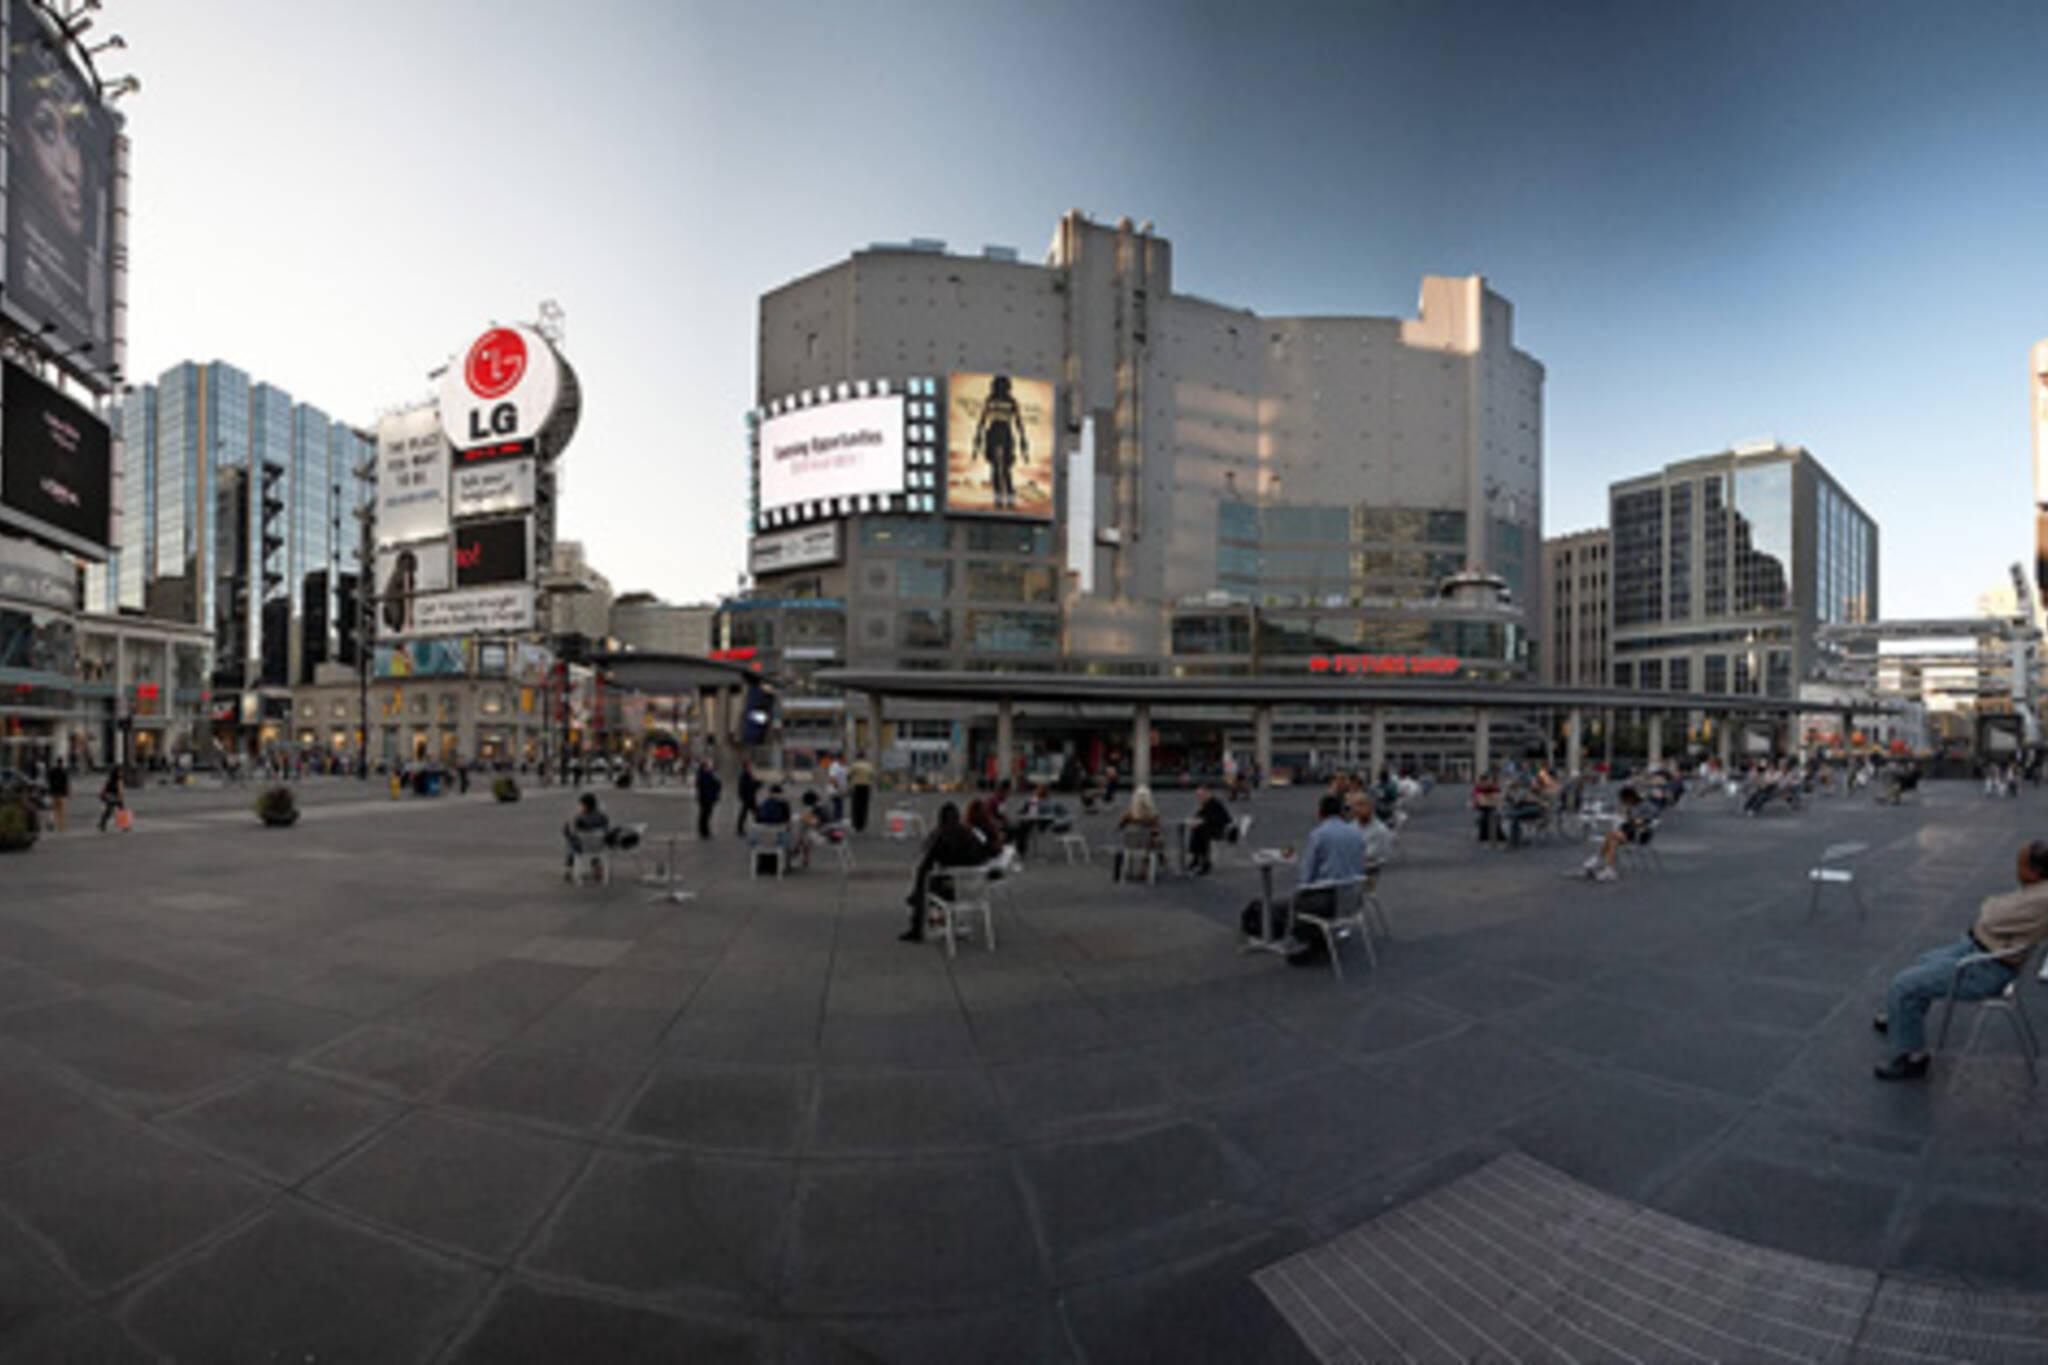 Yonge and Dundas Square